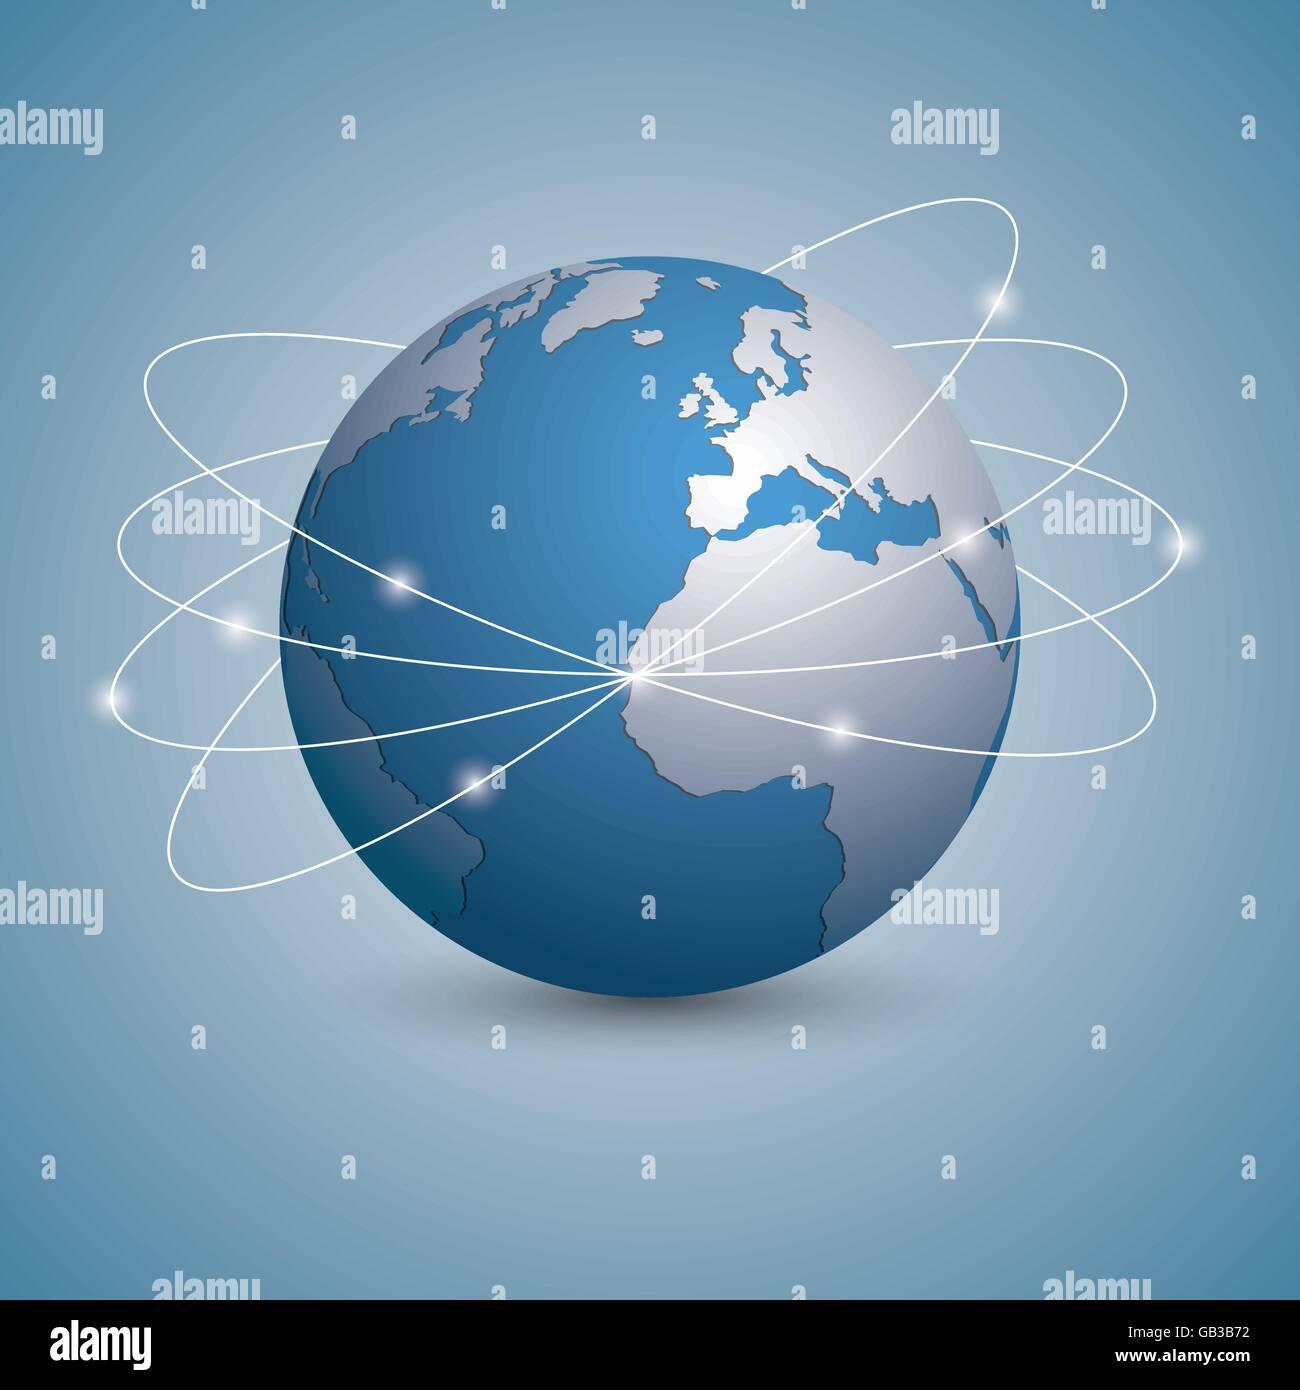 Isolated global communication logo - Stock Vector